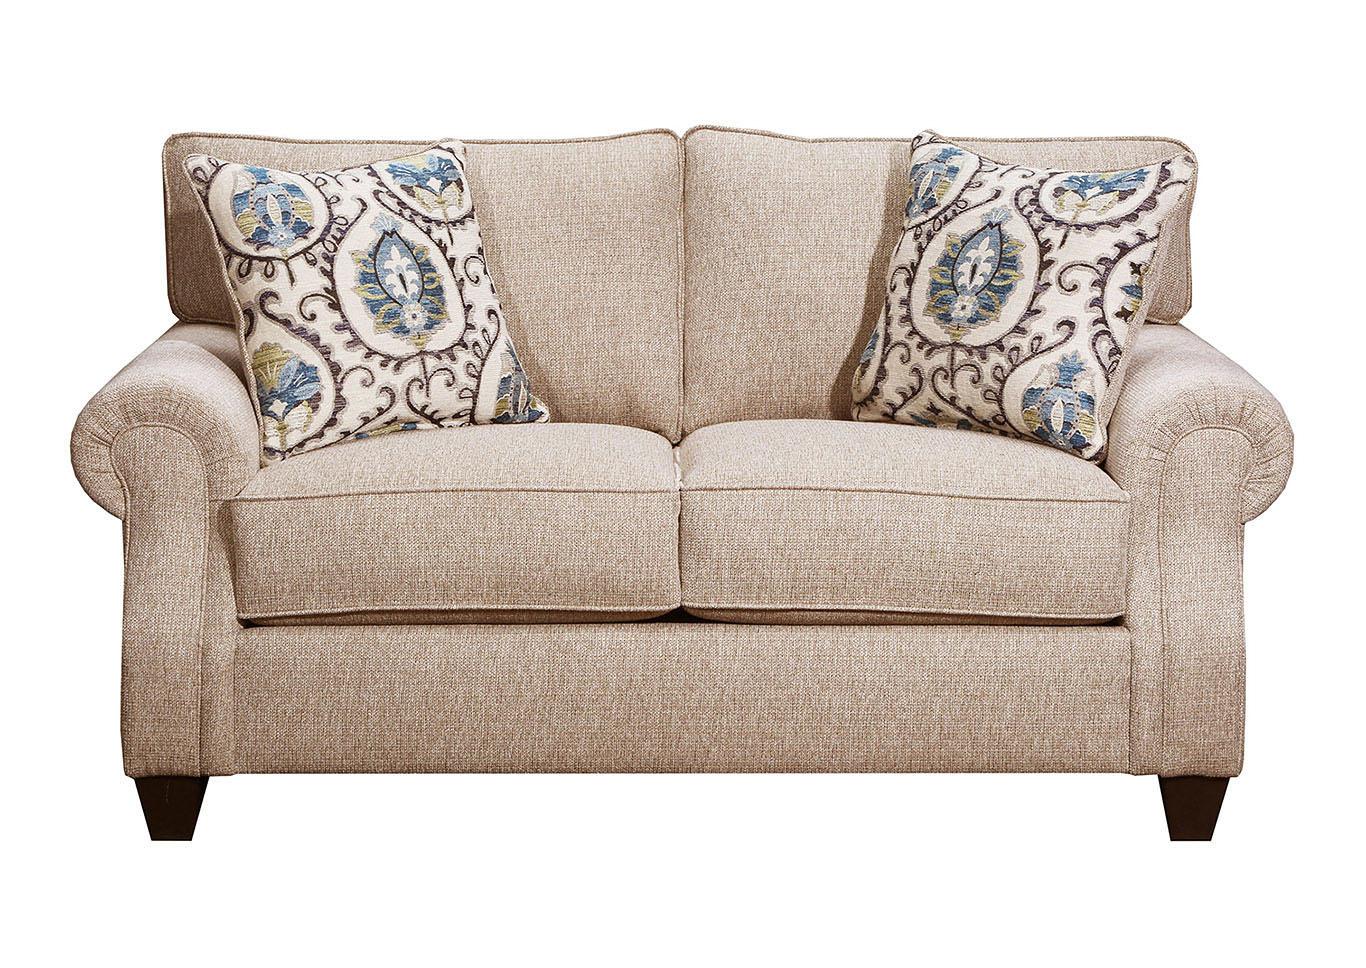 Lane Home Furnishings 8010-02